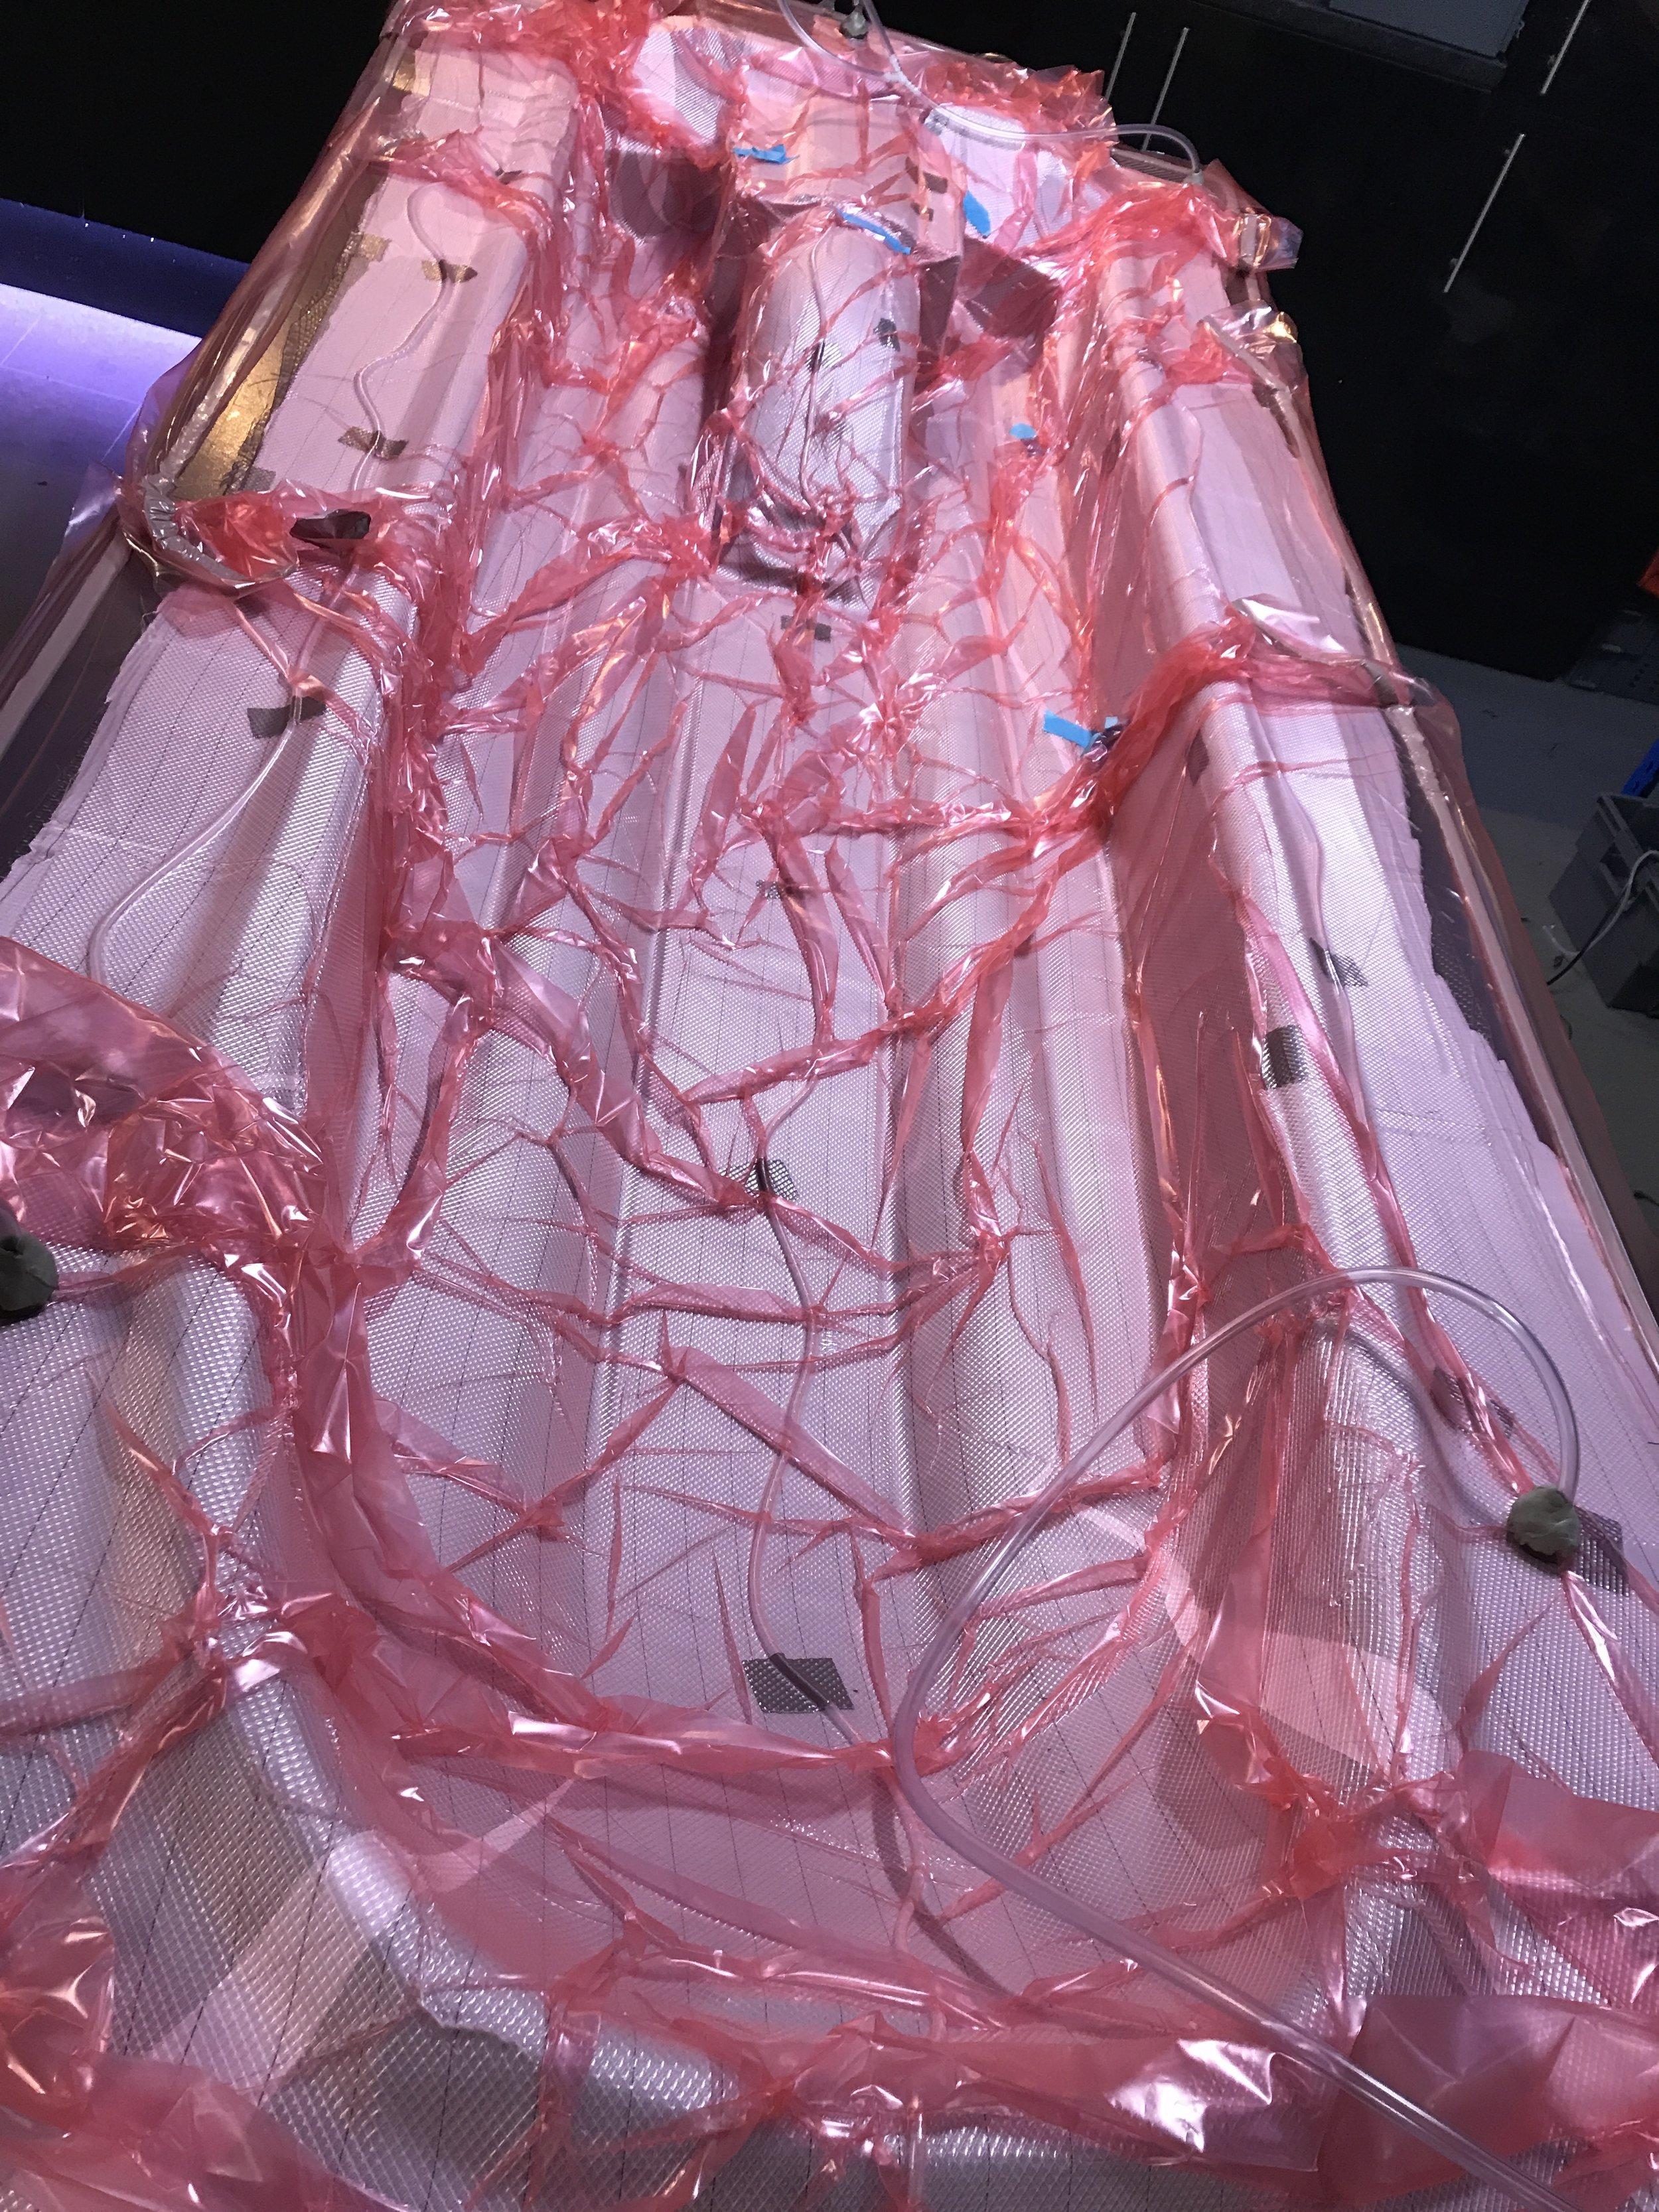 nitro carbon fibreglass infusion layup rickter yamaha superjet freestyle freeride (4).JPG